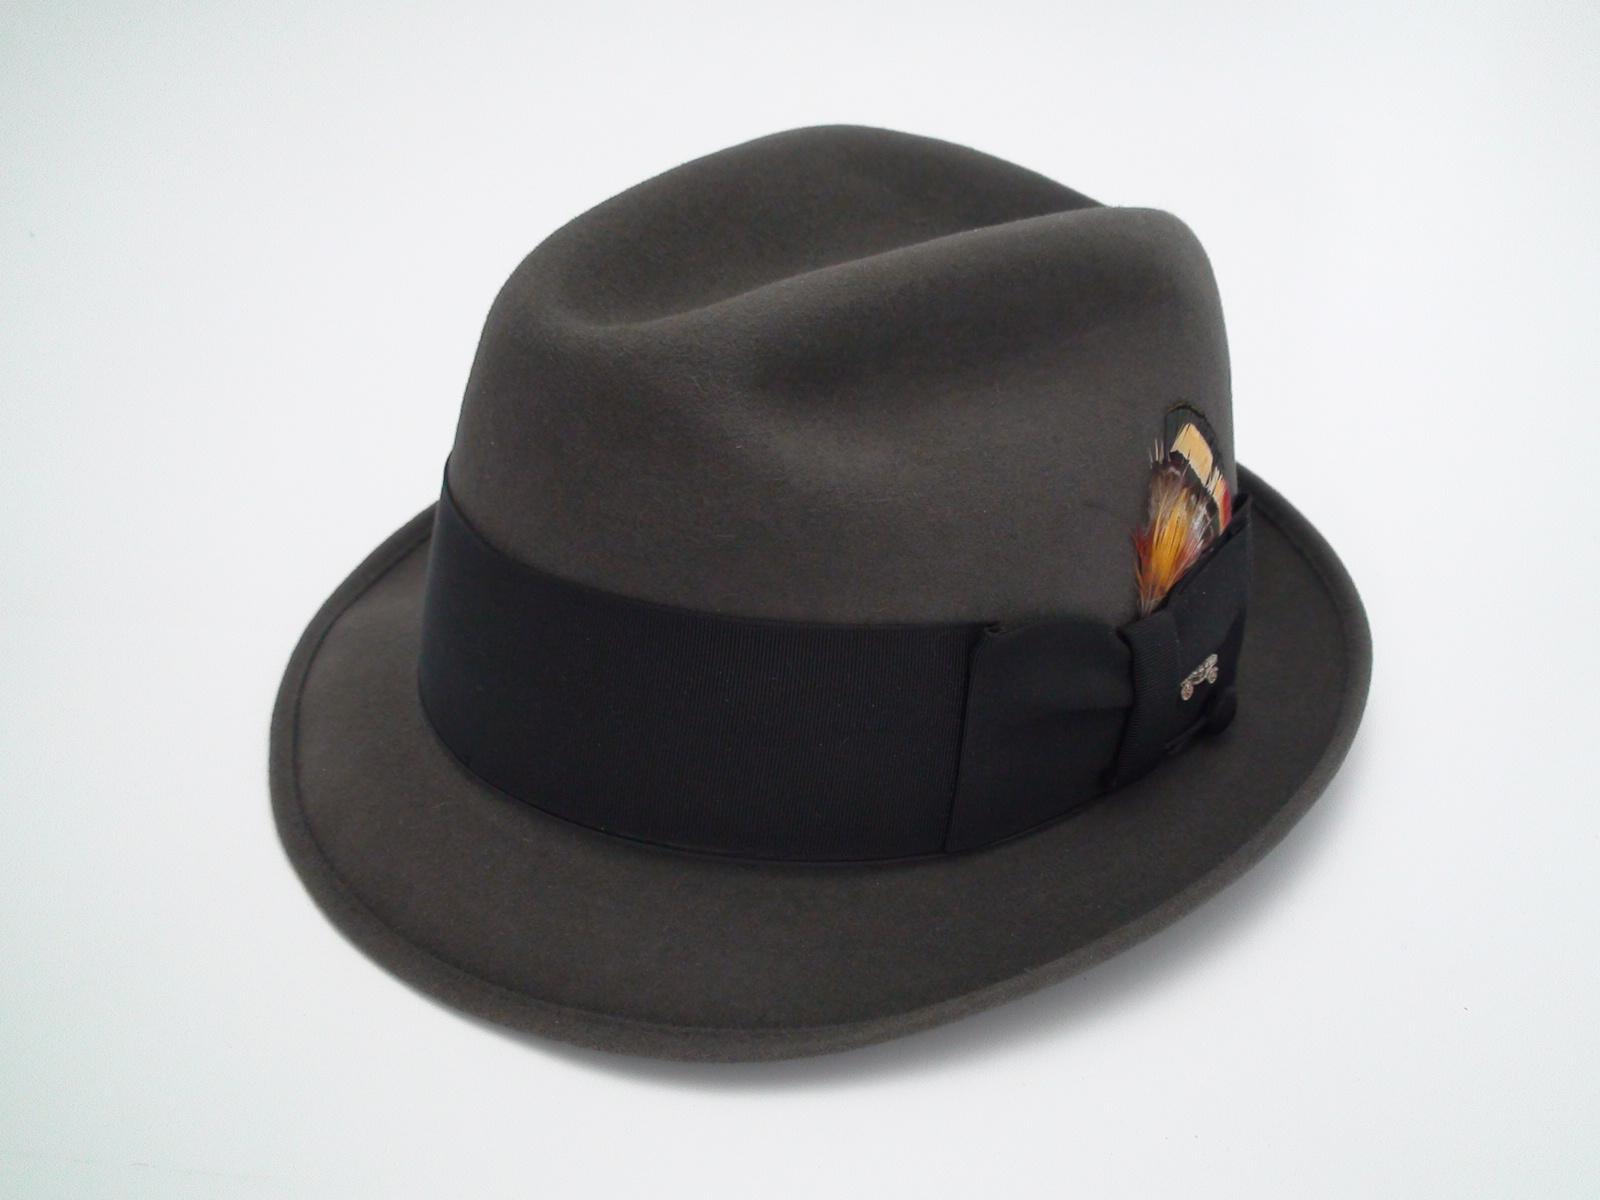 a8649d916e0 Champ Hats Feel The Felt Kasmir Finish Gray Fur Felt Trilby Fedora Hat